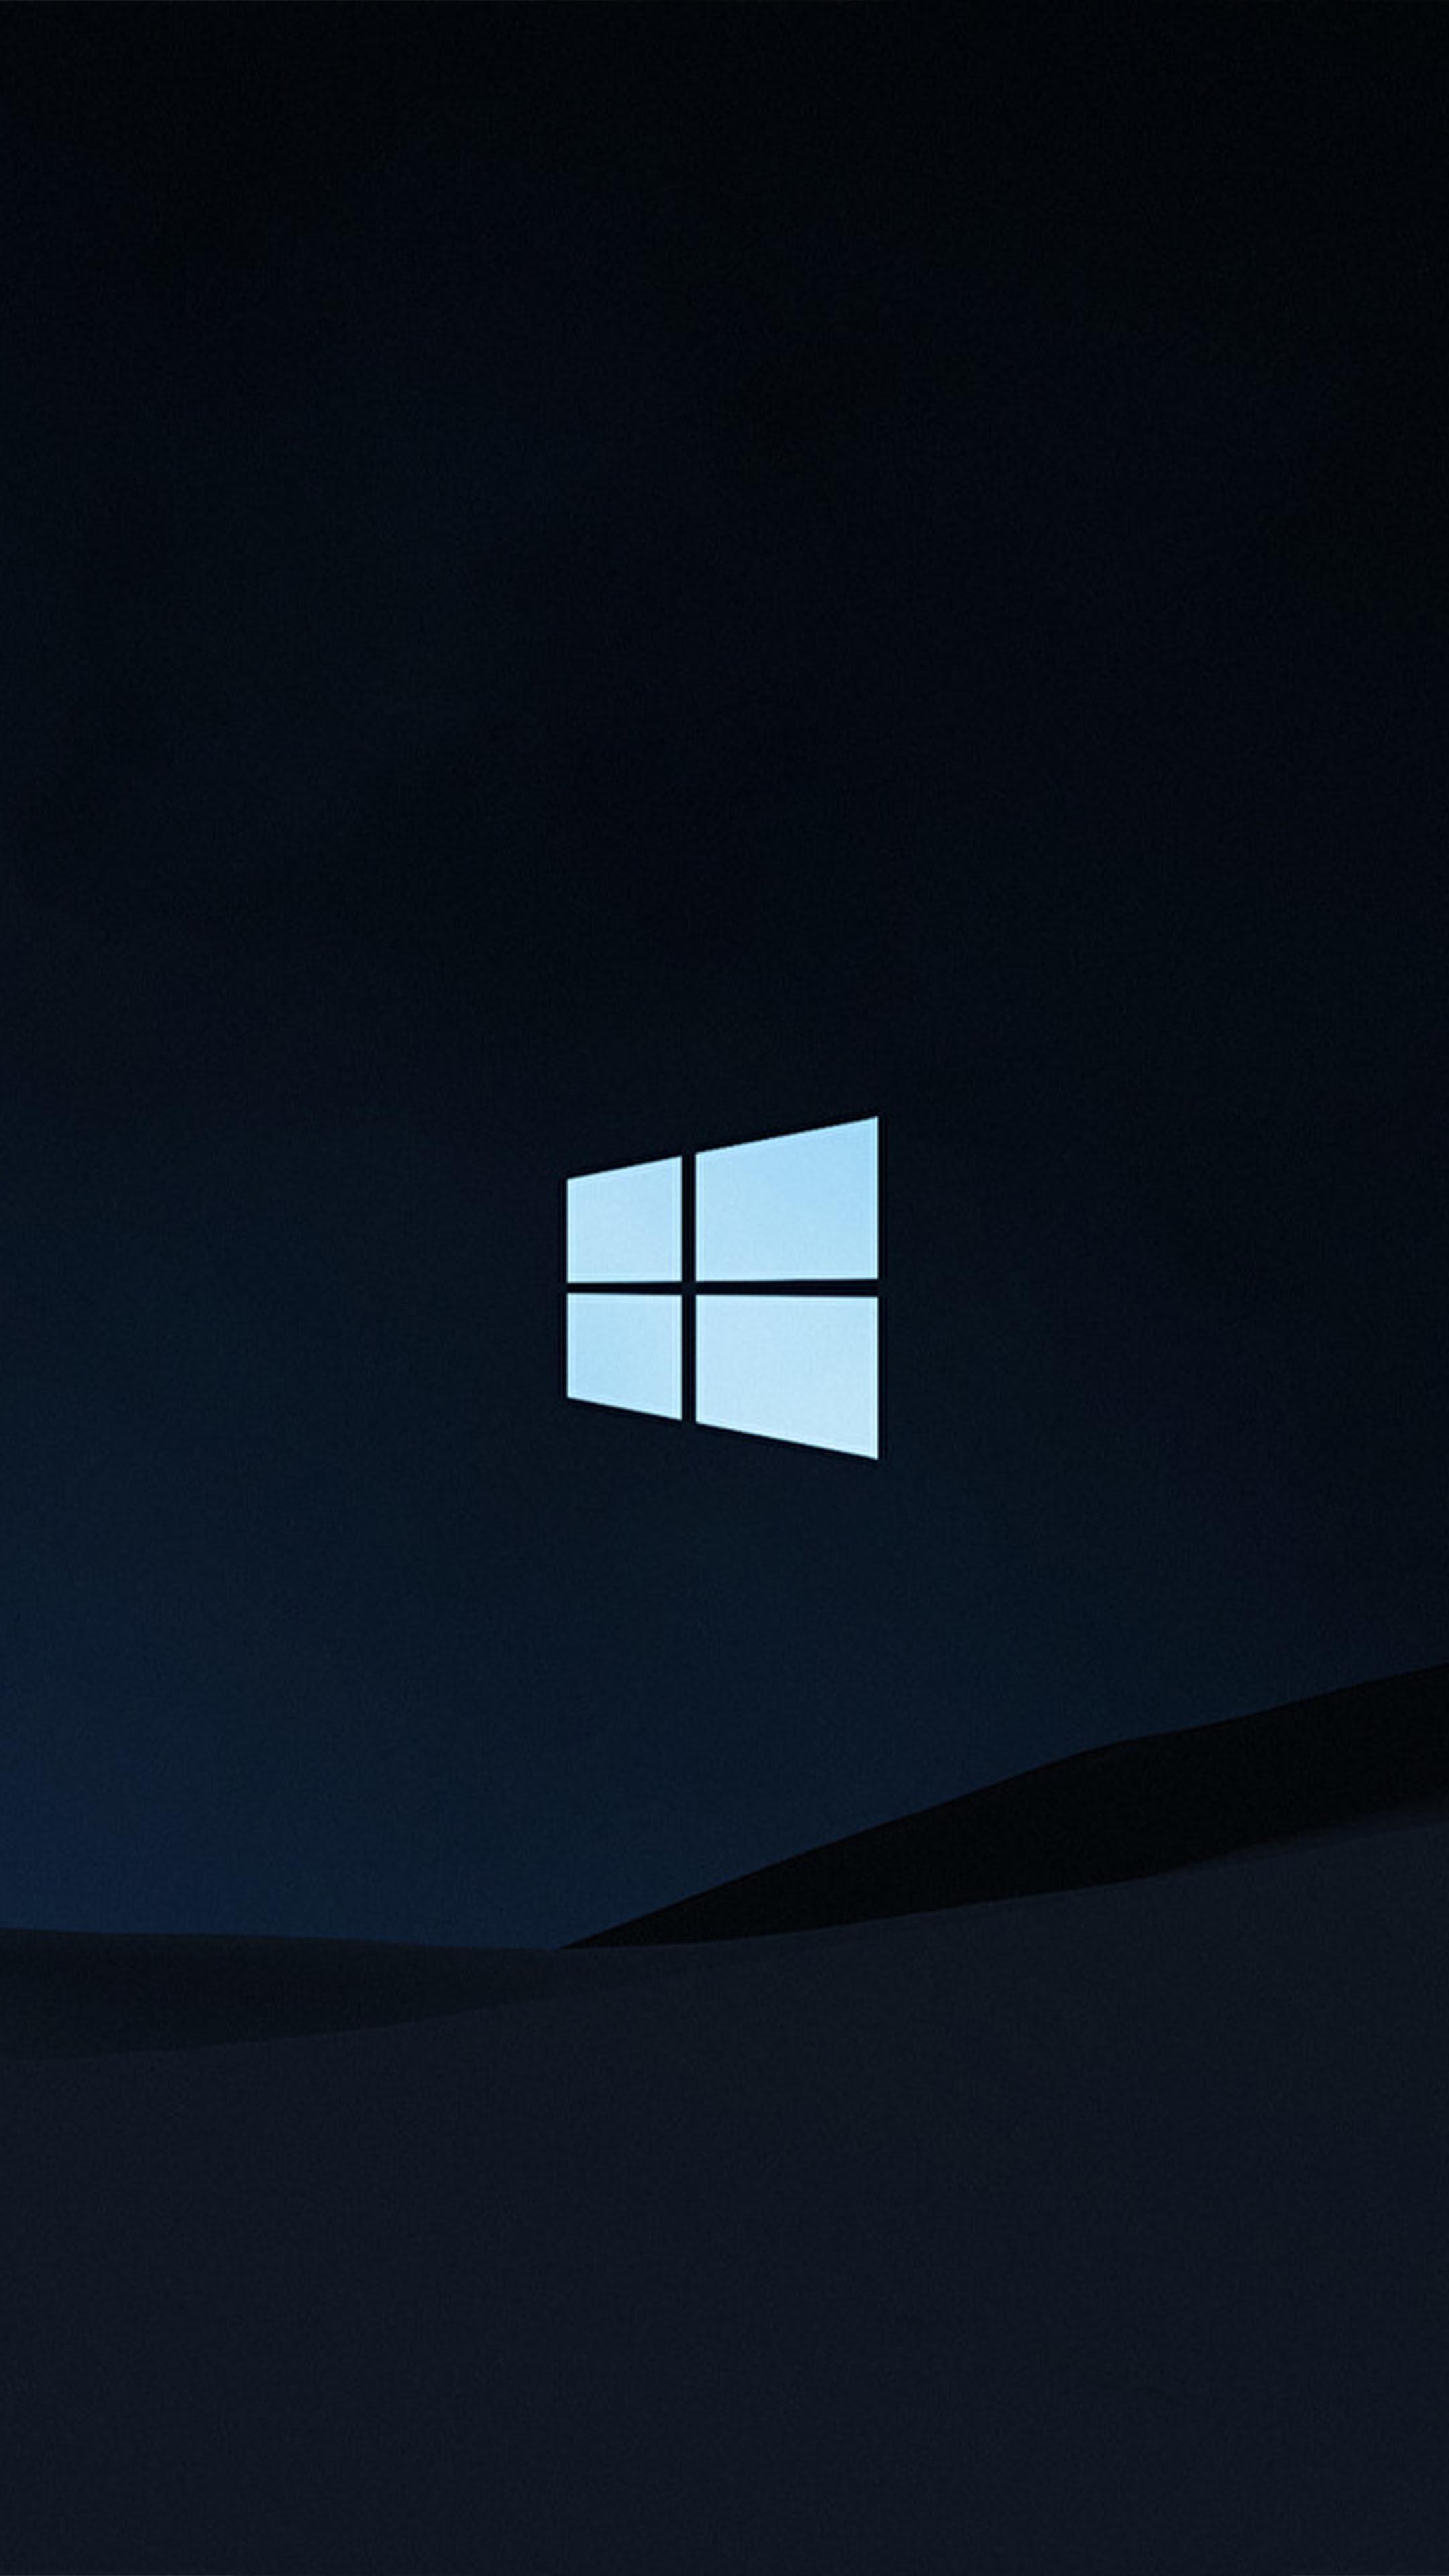 Windows 10 Logo Dark Background 4k Ultra Hd Mobile Wallpaper